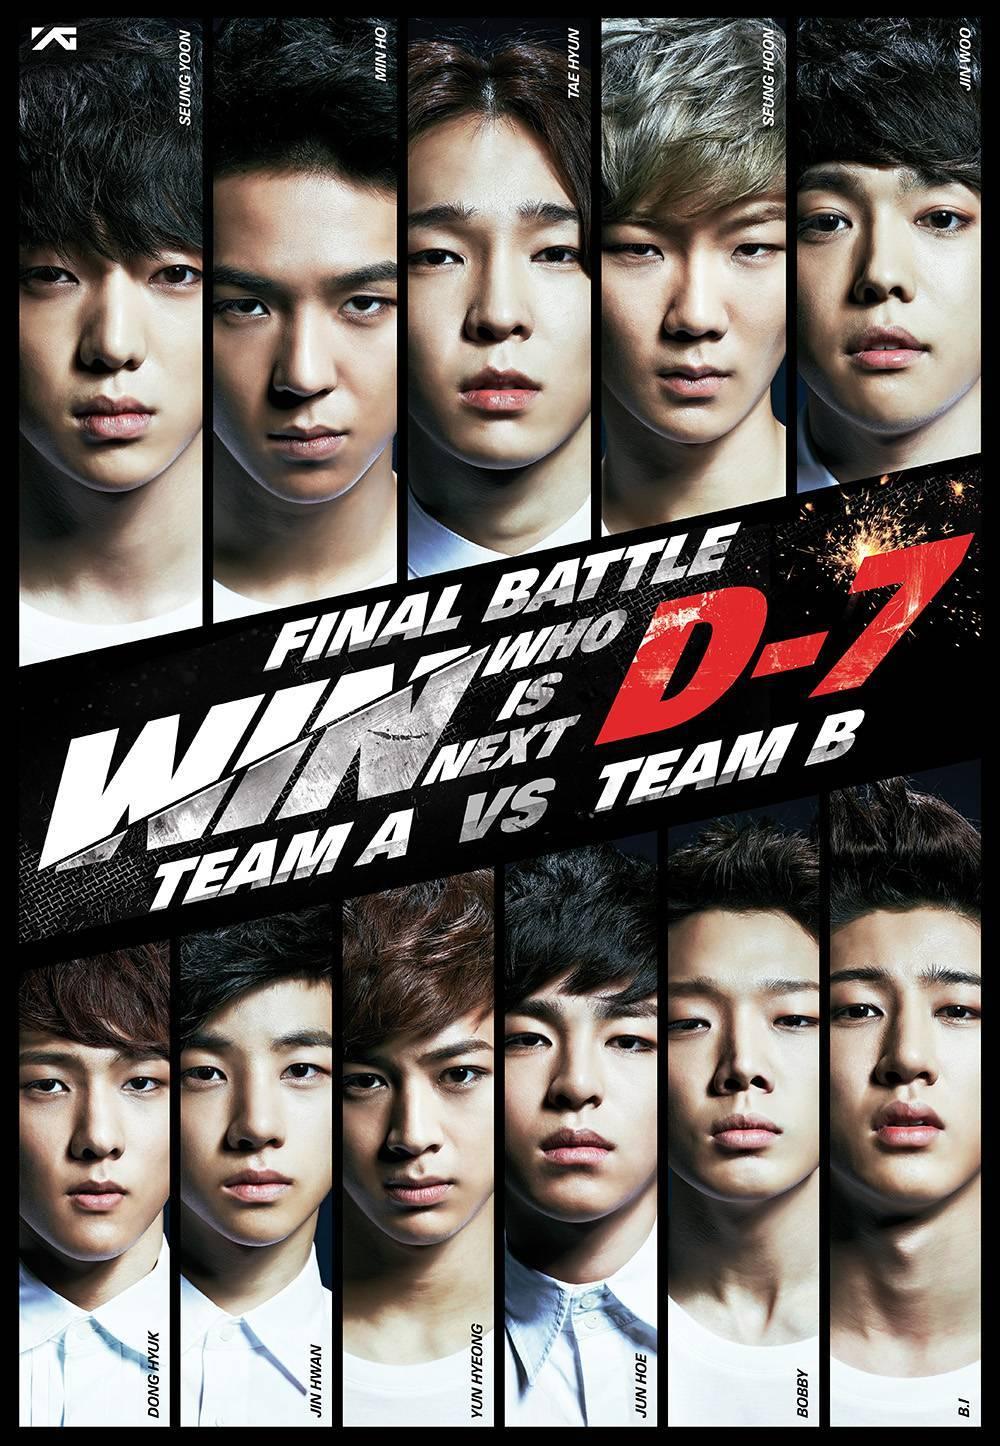 YG Entertainment ยืนยันจะเดบิวต์ WINNER ในเดือนกุมภา จะเดบิวต์ 4 กลุ่มใหม่ เป็นไปได้ที่จะมี Team B!!